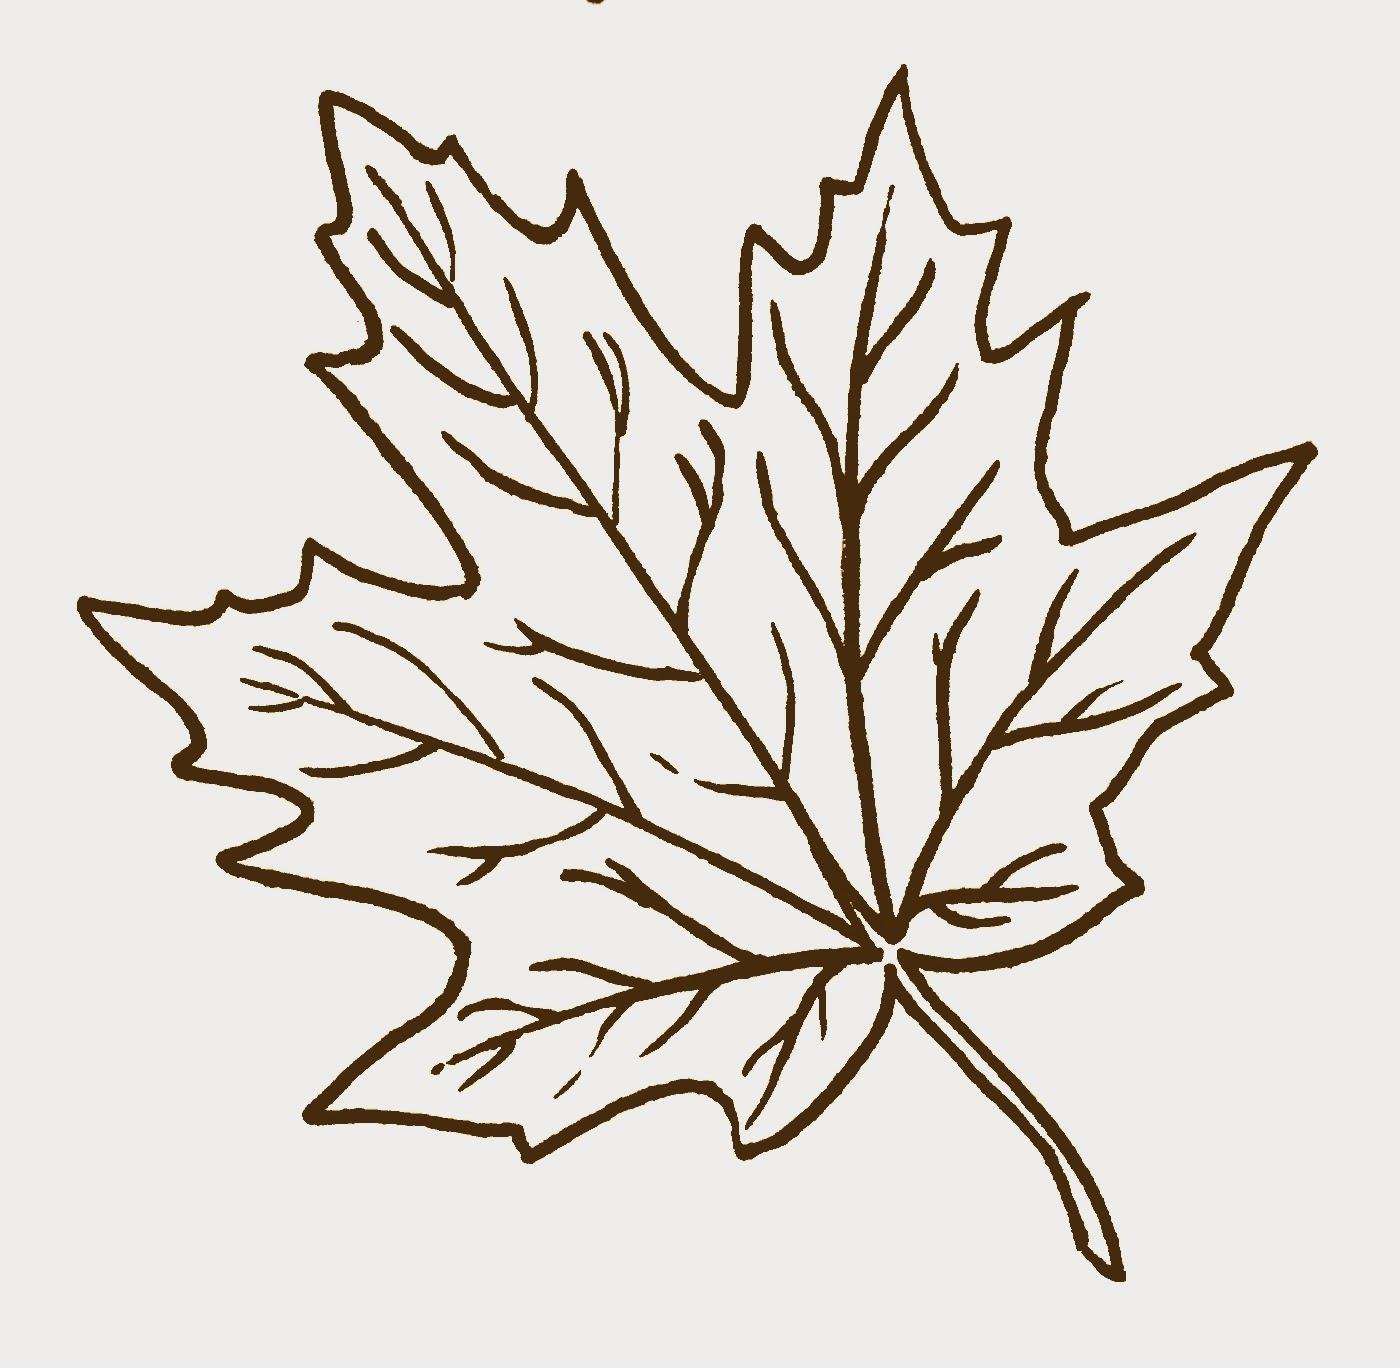 leaf pattern clipart - photo #48